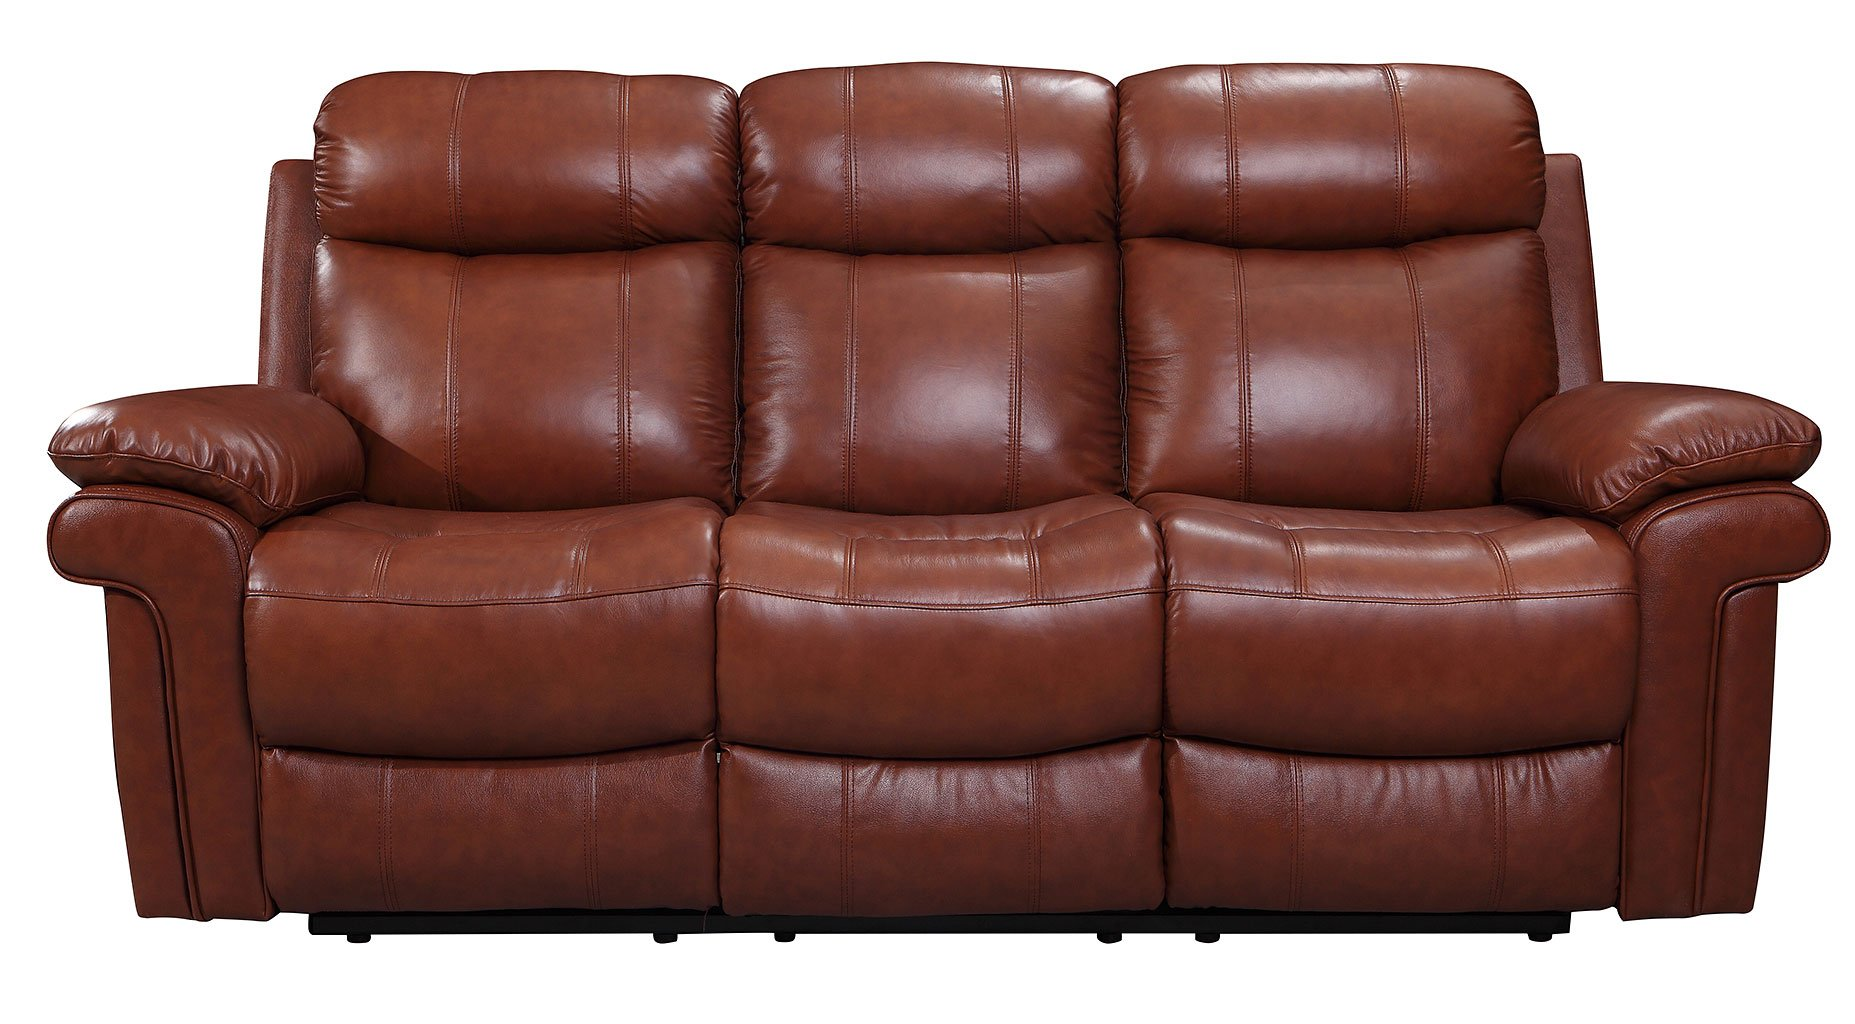 Joplin Power Reclining Sofa Saddle By Leather Italia